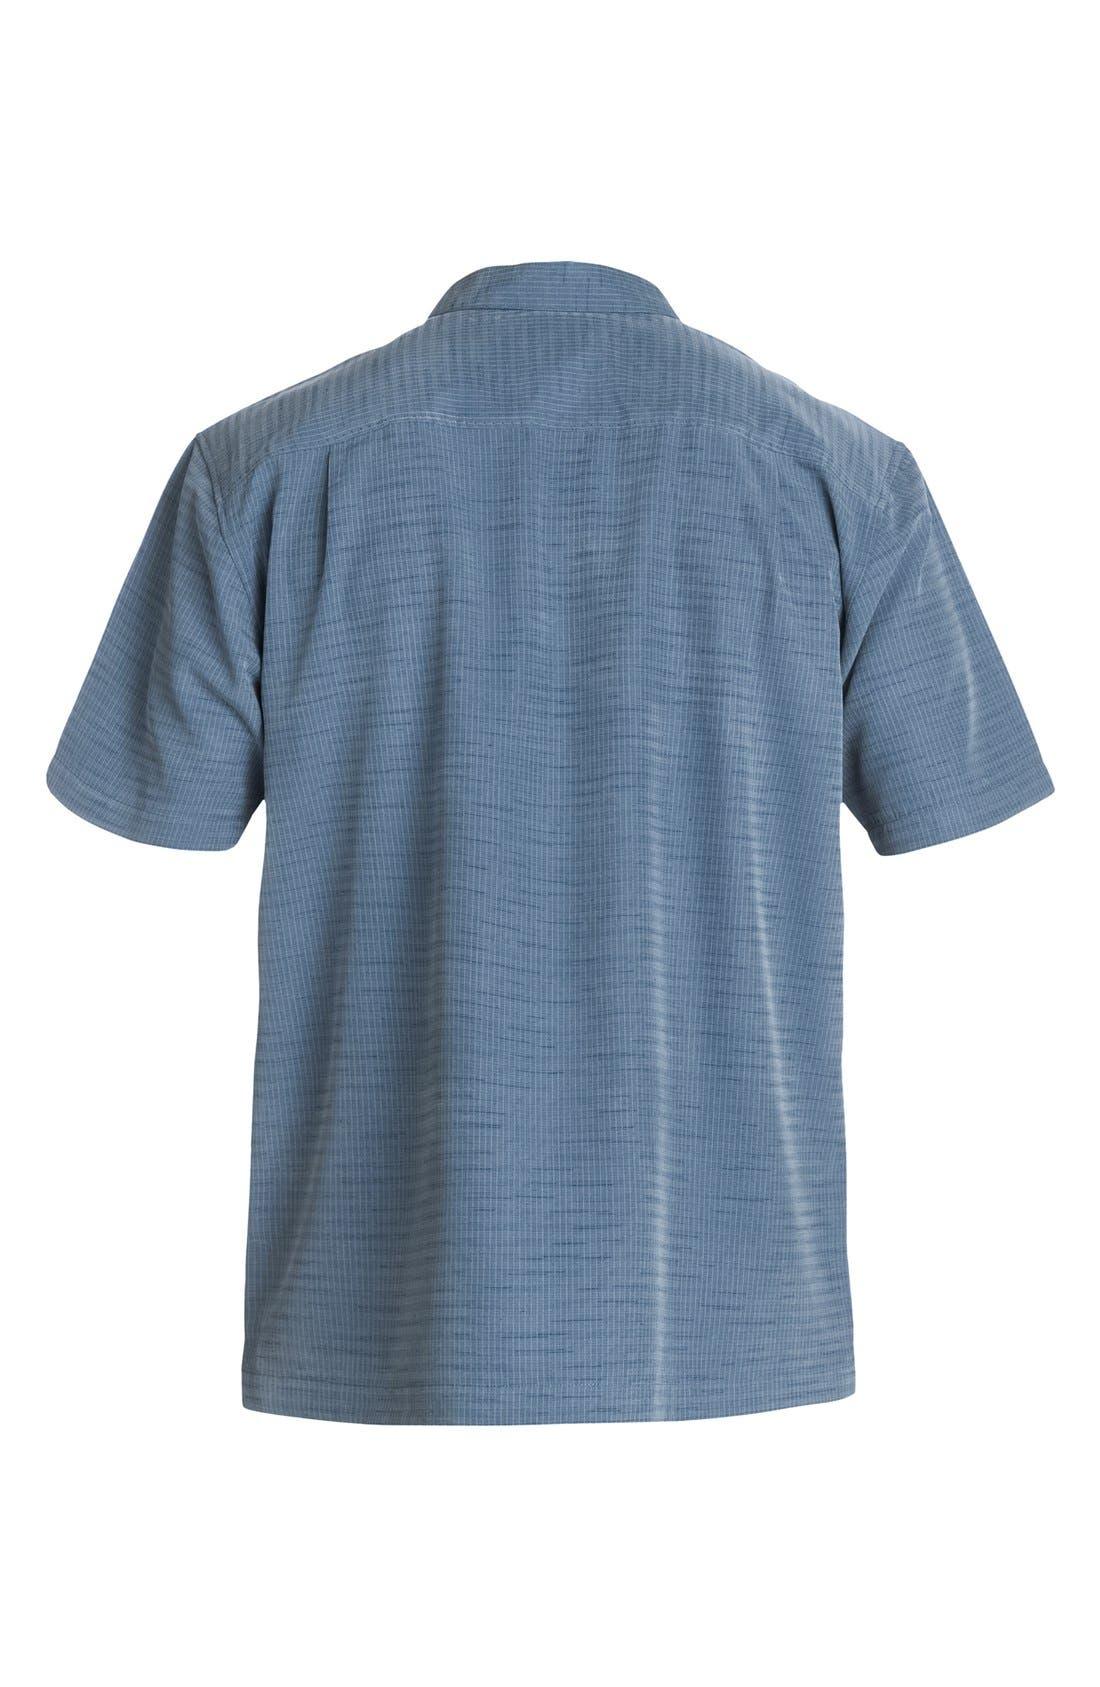 'Centinela 4' Short Sleeve Sport Shirt,                             Alternate thumbnail 63, color,